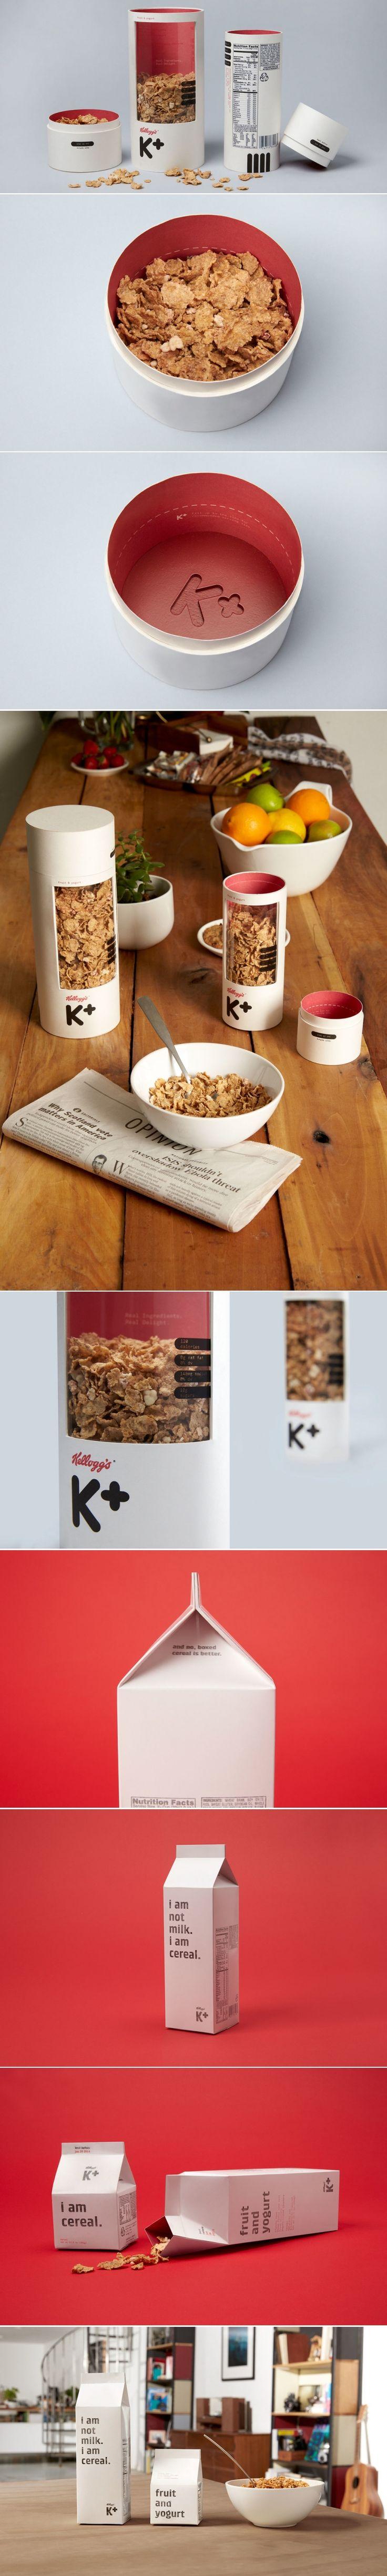 Concept: Kellog's Special K Cereal — The Dieline | Packaging & Branding Design & Innovation News